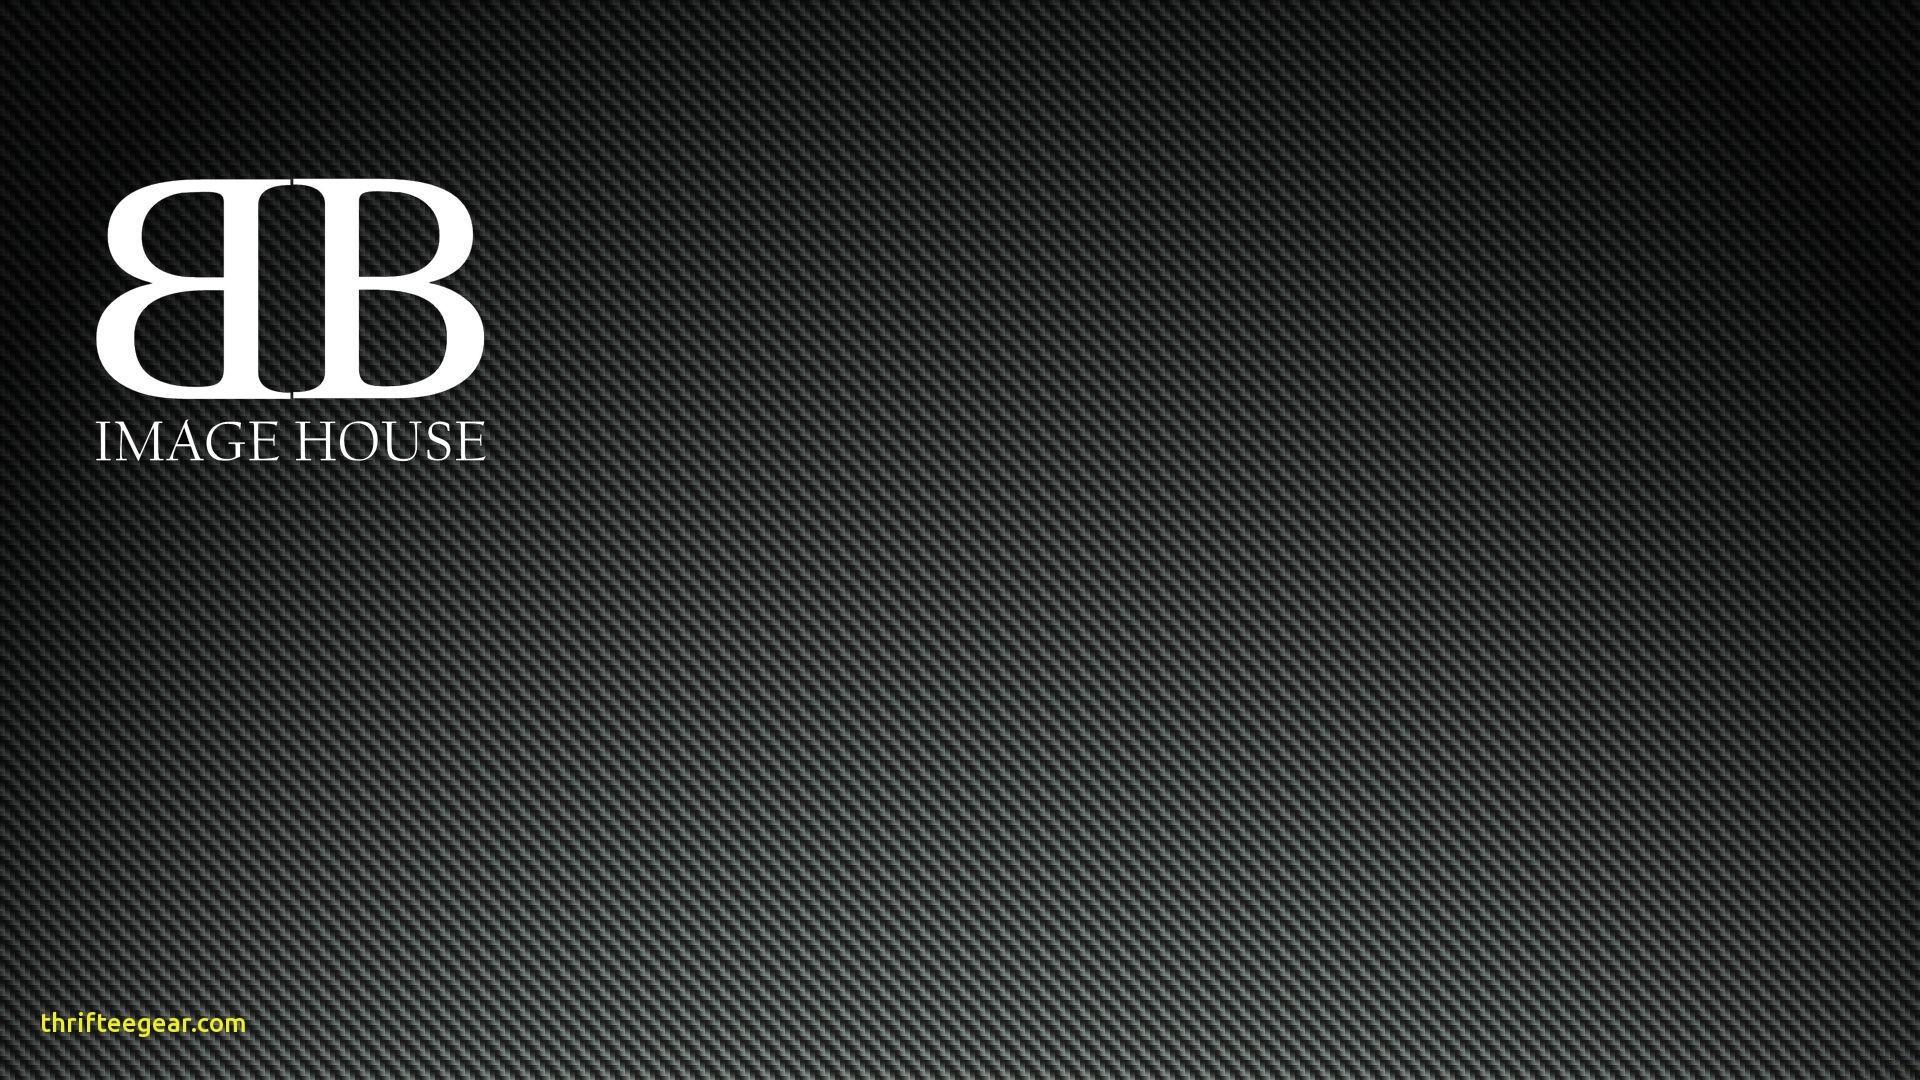 Res: 1920x1080, Carbon Fiber iPhone Wallpaper 1024—600 Carbon Fibre Wallpapers 26 Wallpapers  Adorable Wallpapers Wallpapers Pinterest